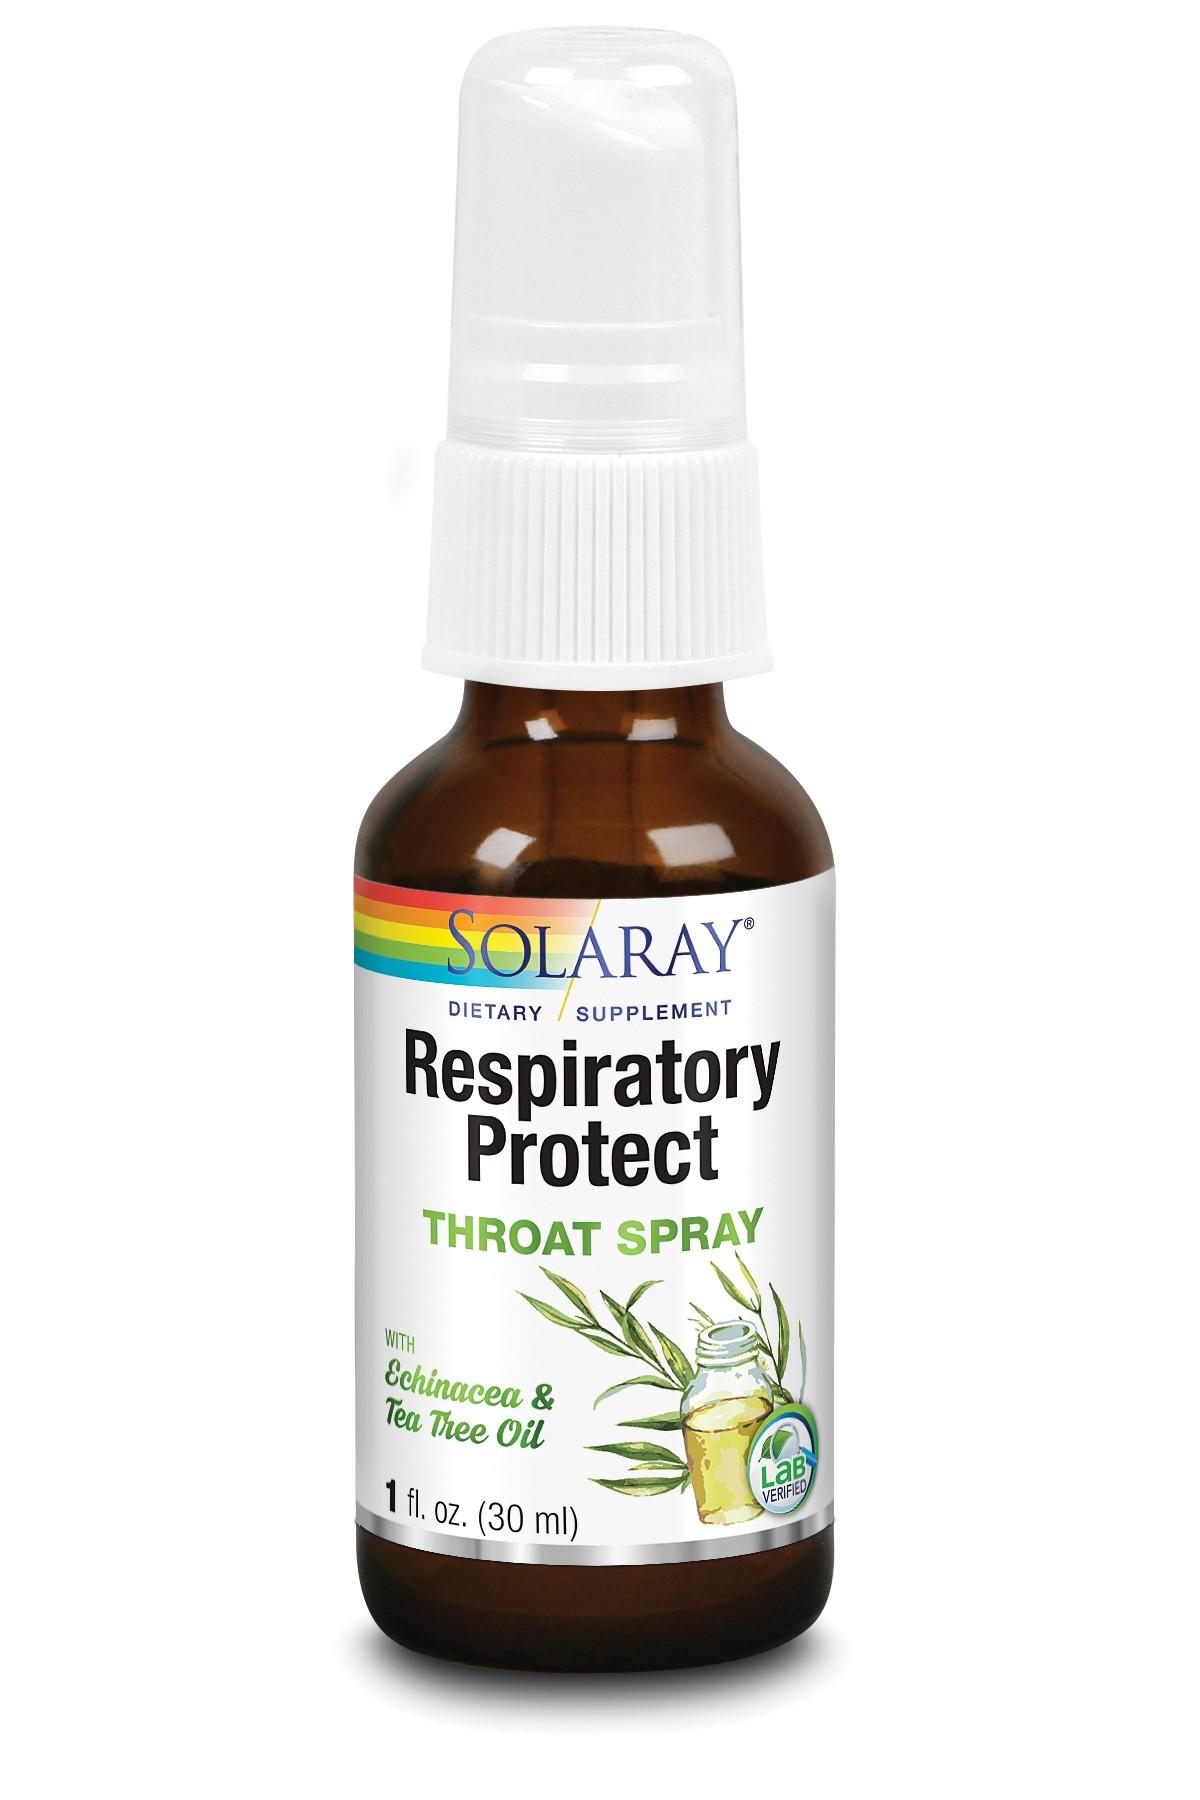 Respiratory Protect Throat Spray (30 ml), Solaray